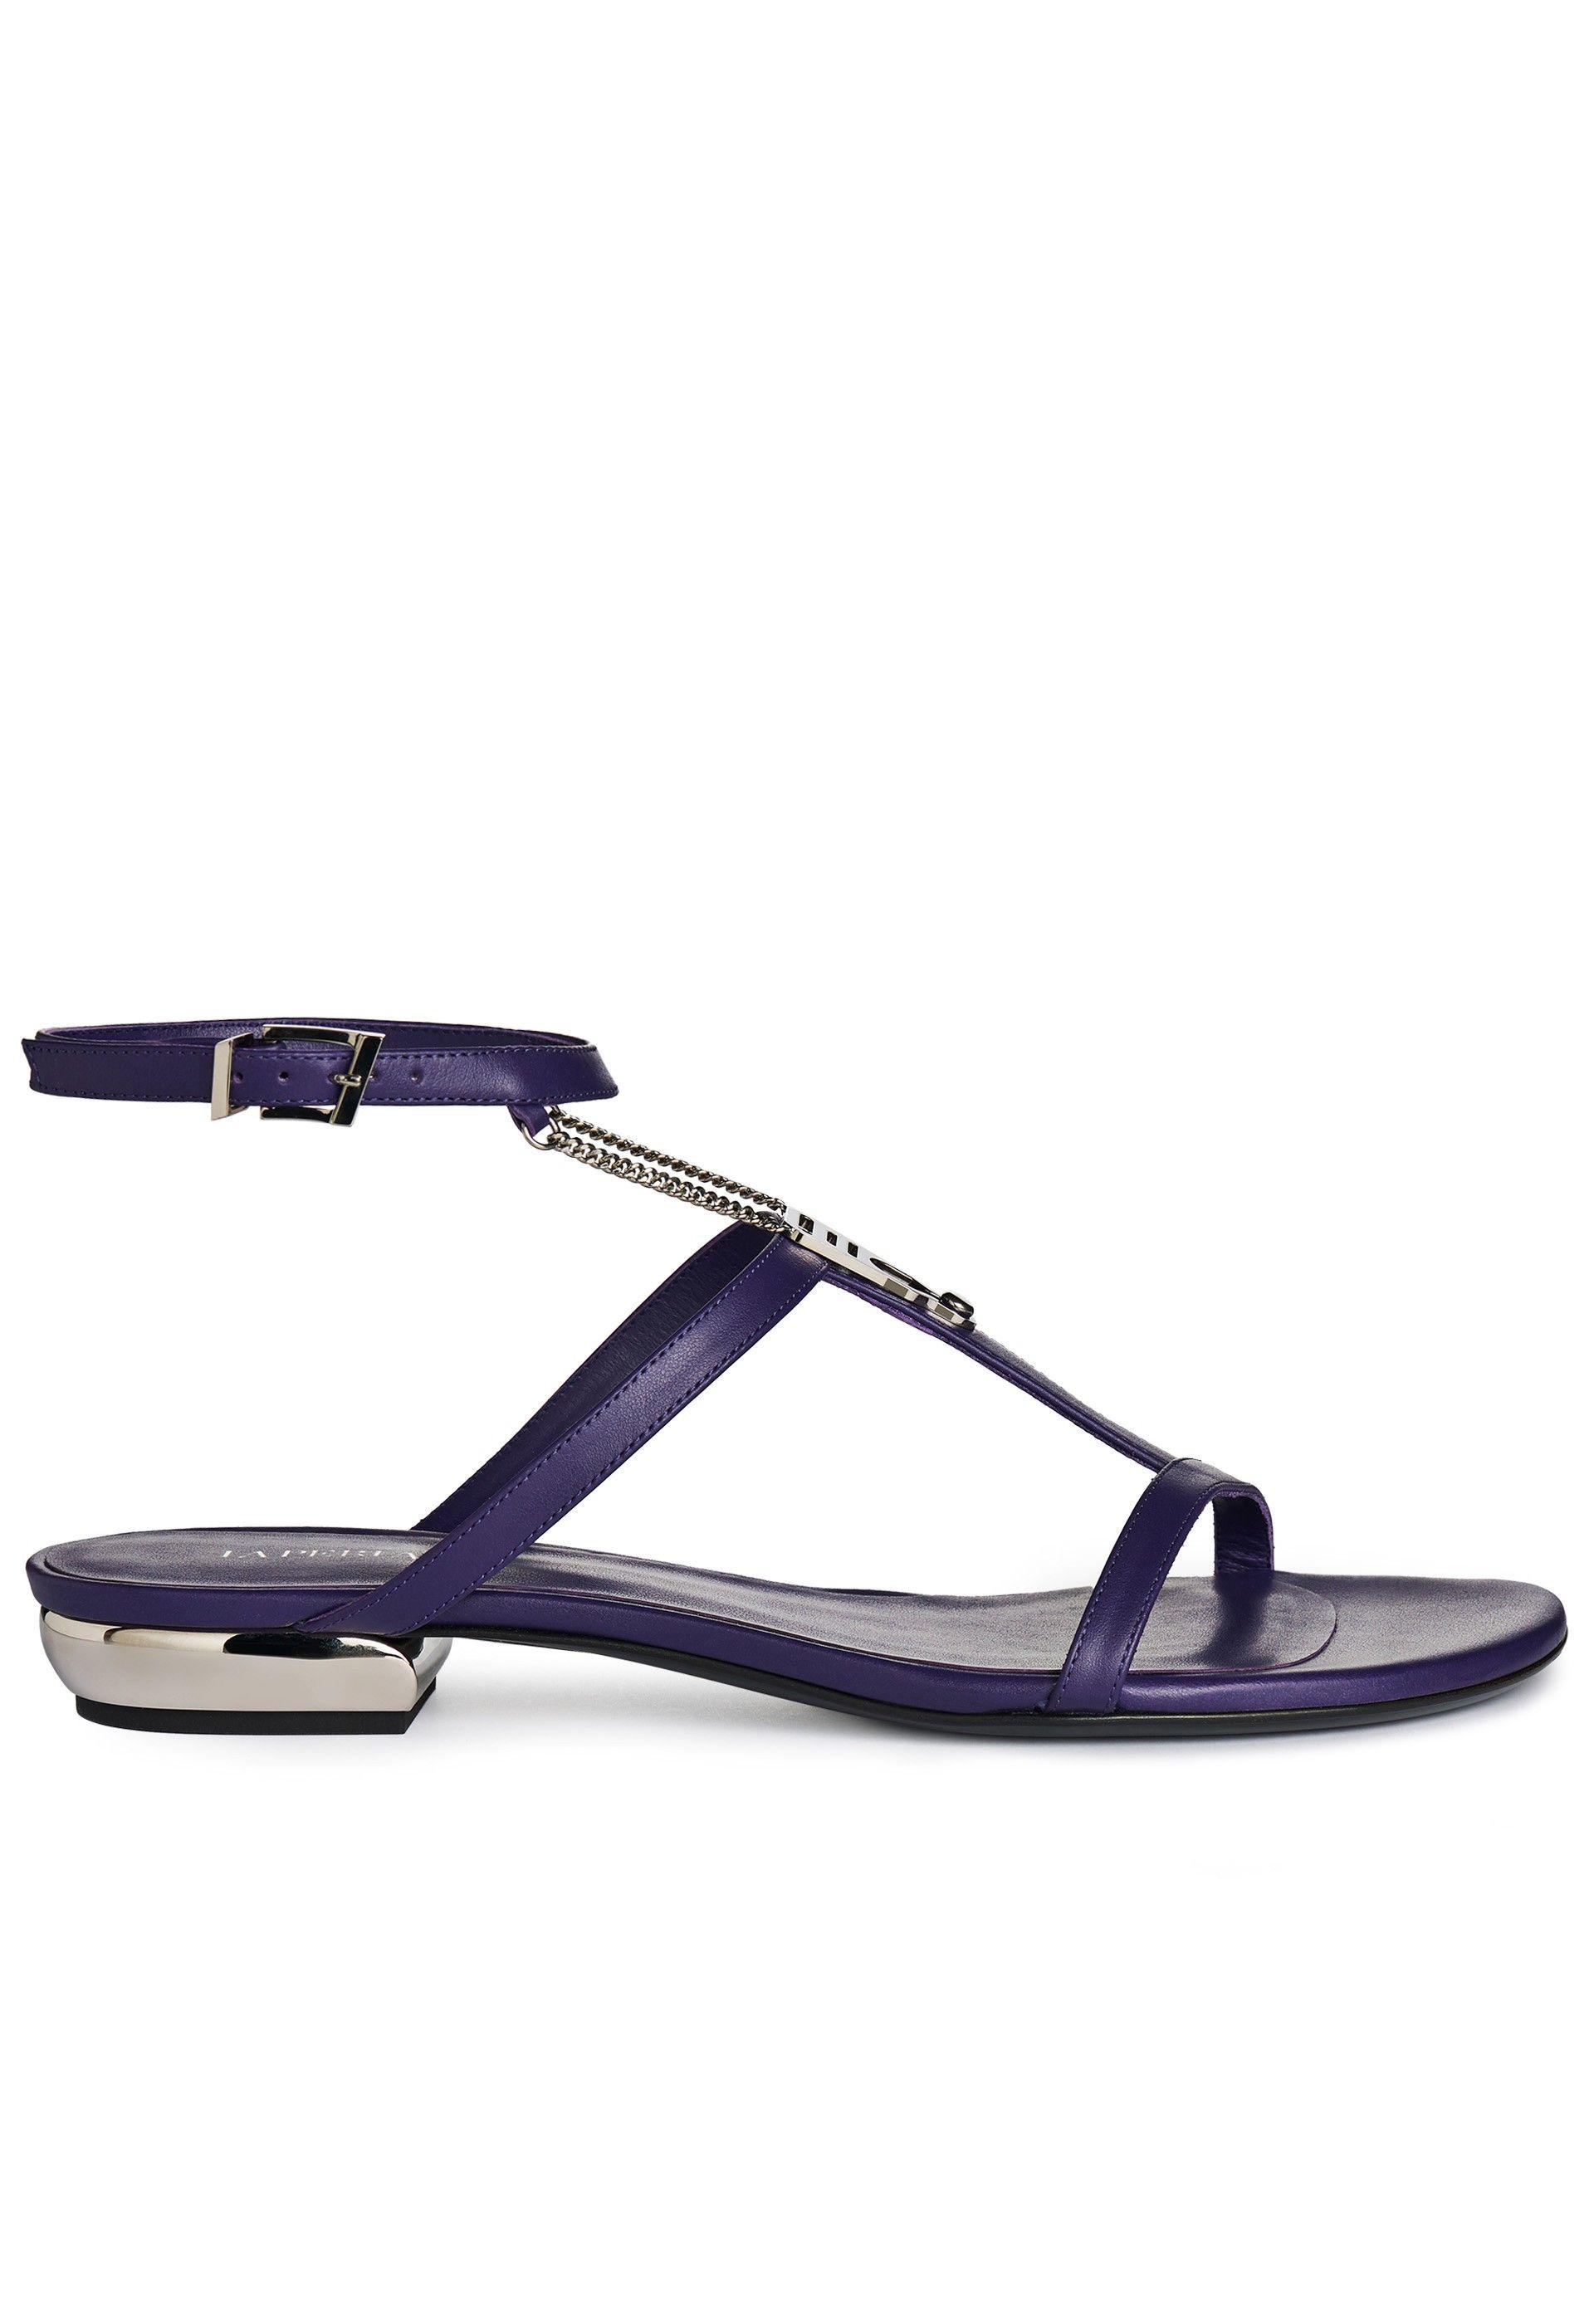 GIUSEPPE ZANOTTI Giuseppe Zanotti Giuseppe Zanotti Bar Strap Flat Sandals Shoes Sandals GIUSEPPE ZANOTTI Fashion